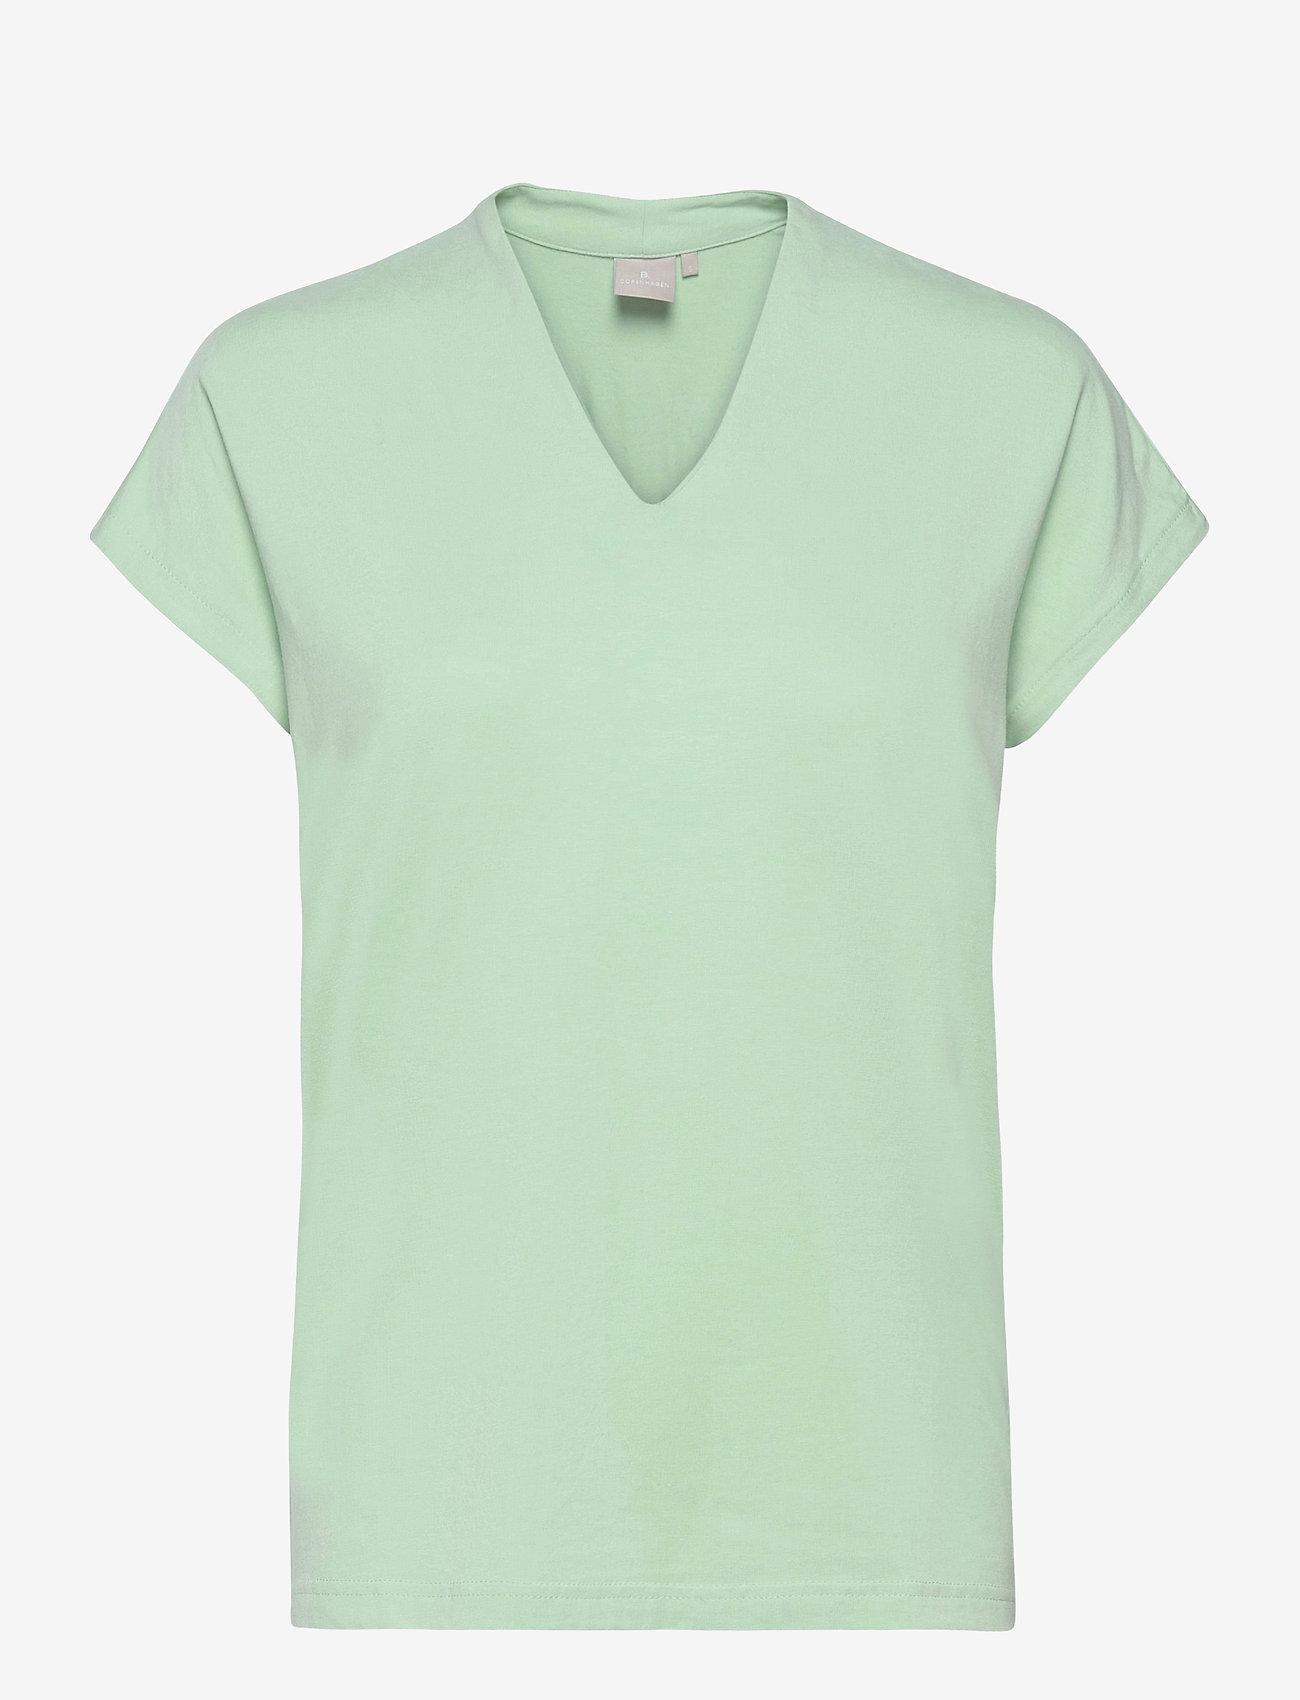 Brandtex - Sleeveless-jersey - t-shirts - lichen - 0